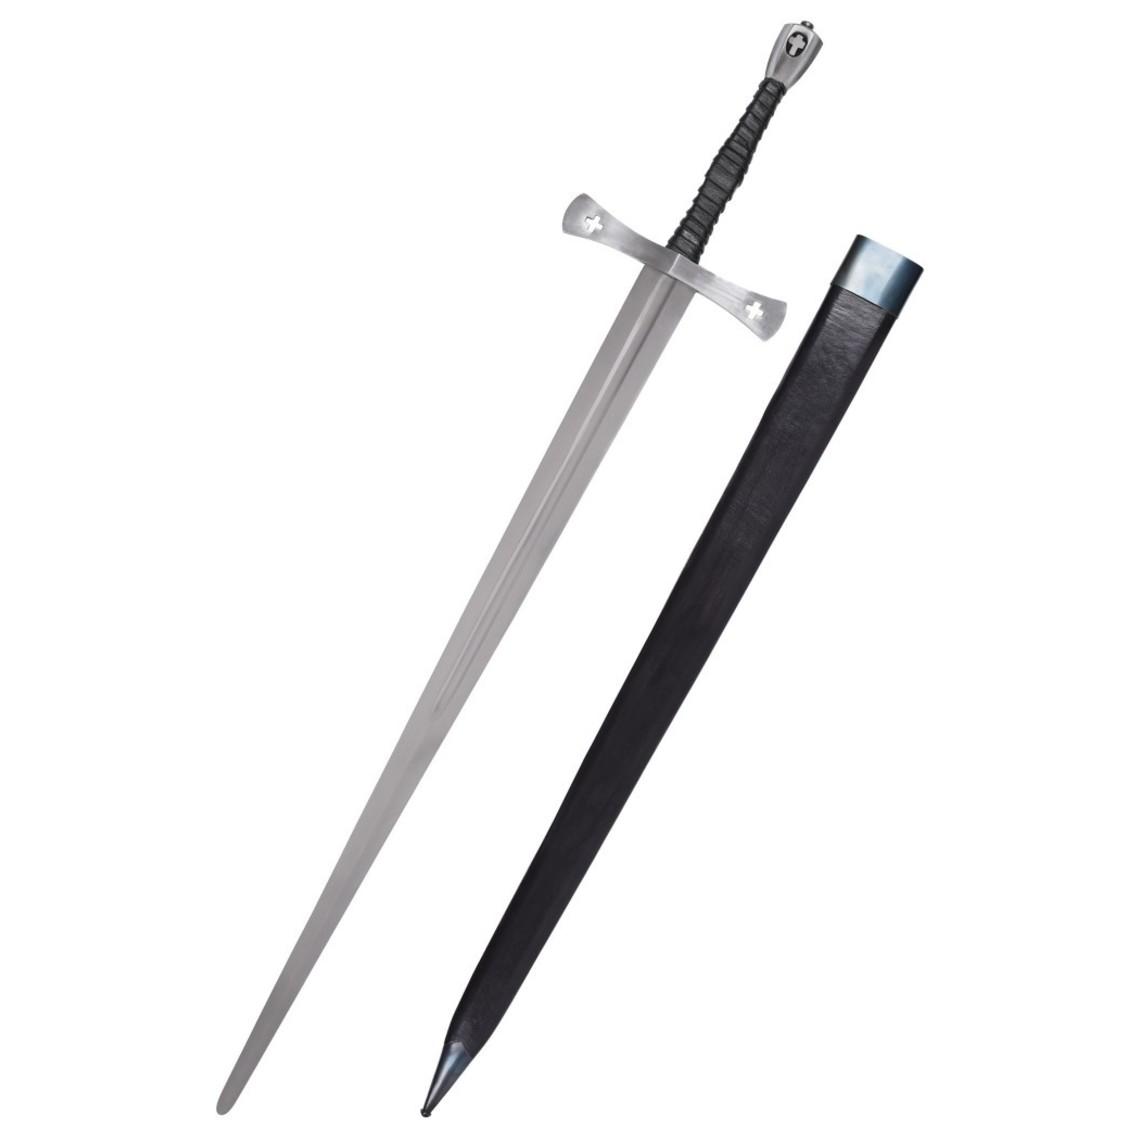 Deepeeka 15th century Tewkesbury hand-and-a-half sword, semi-sharp